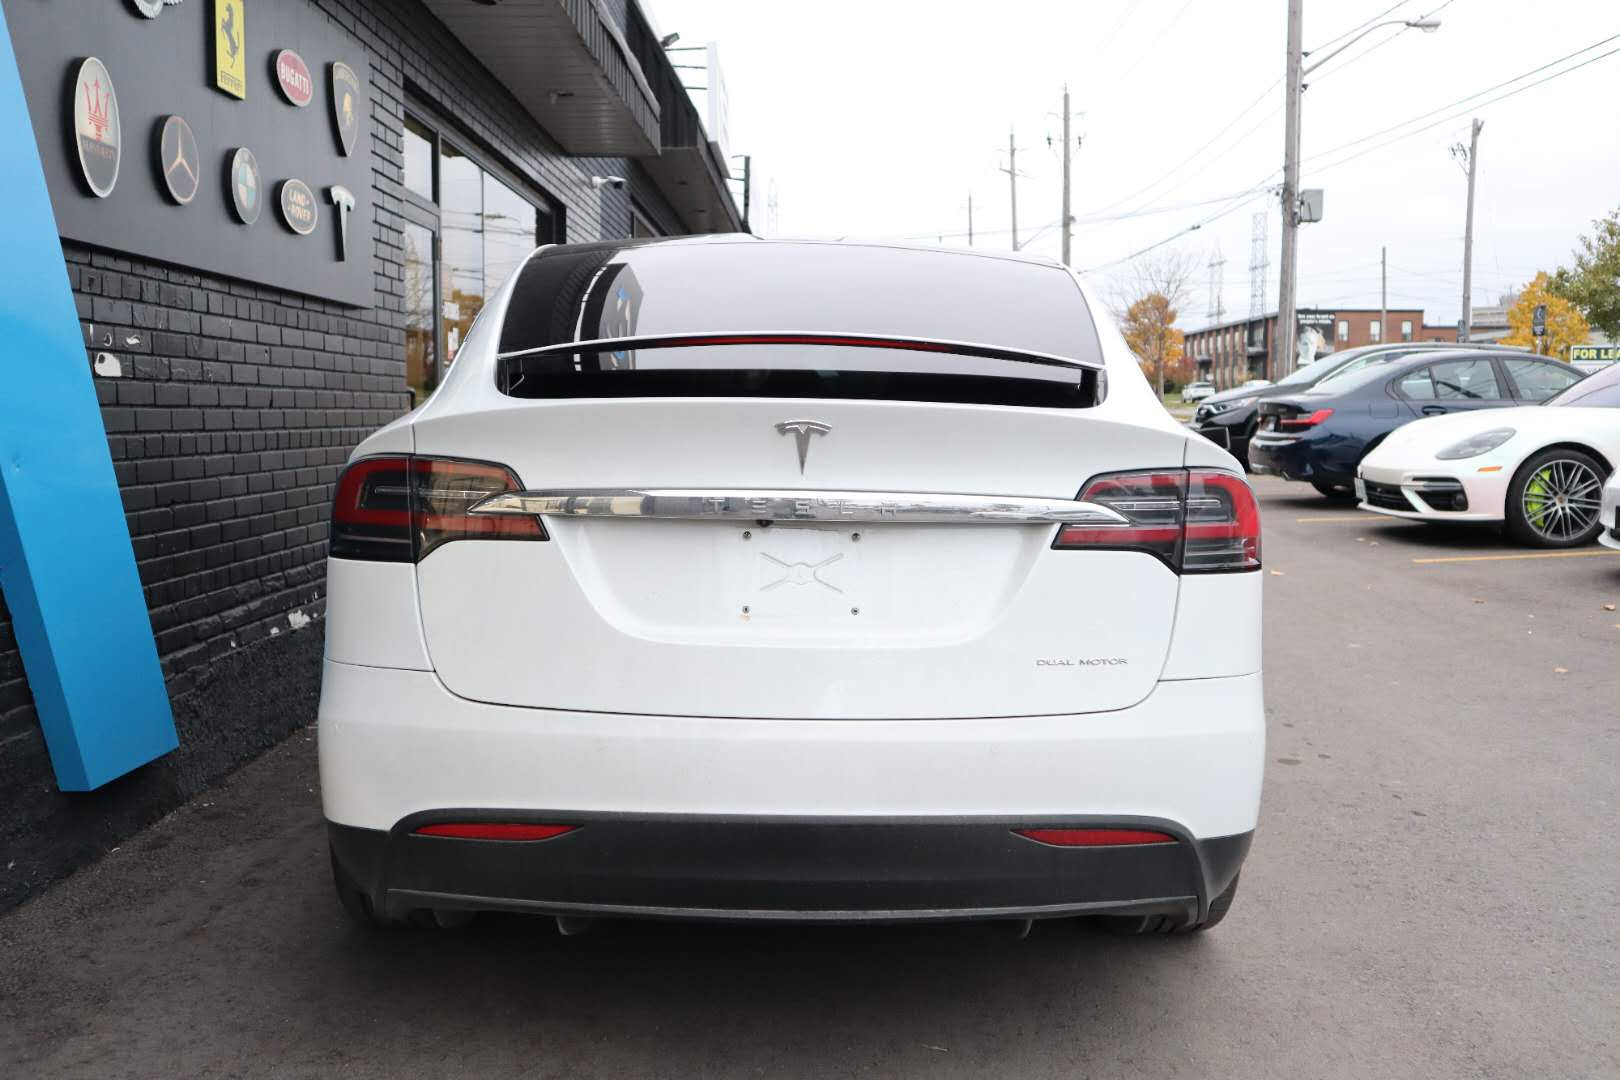 2019 Tesla Model X LONG RANGE - INFOCAR - Toronto's Most Comprehensive New and Used Auto Trading Platform